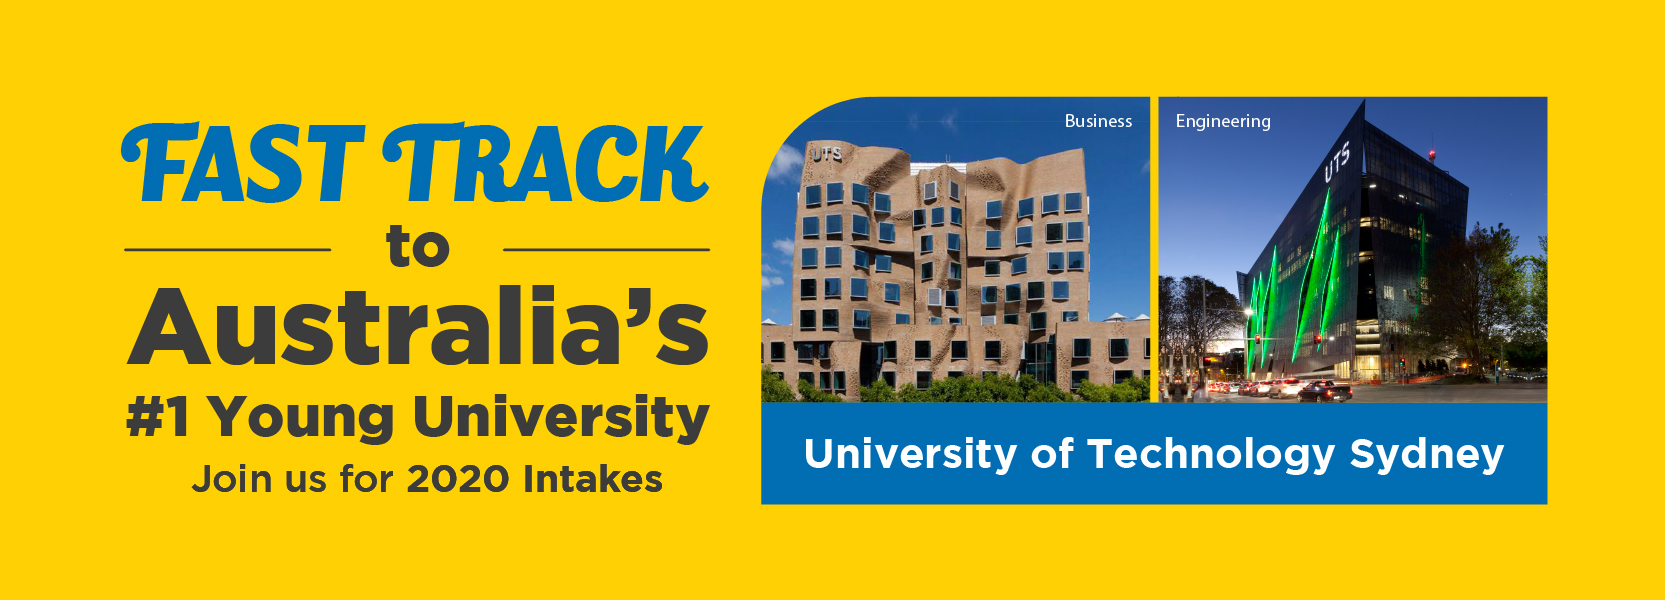 UTS-web-banner